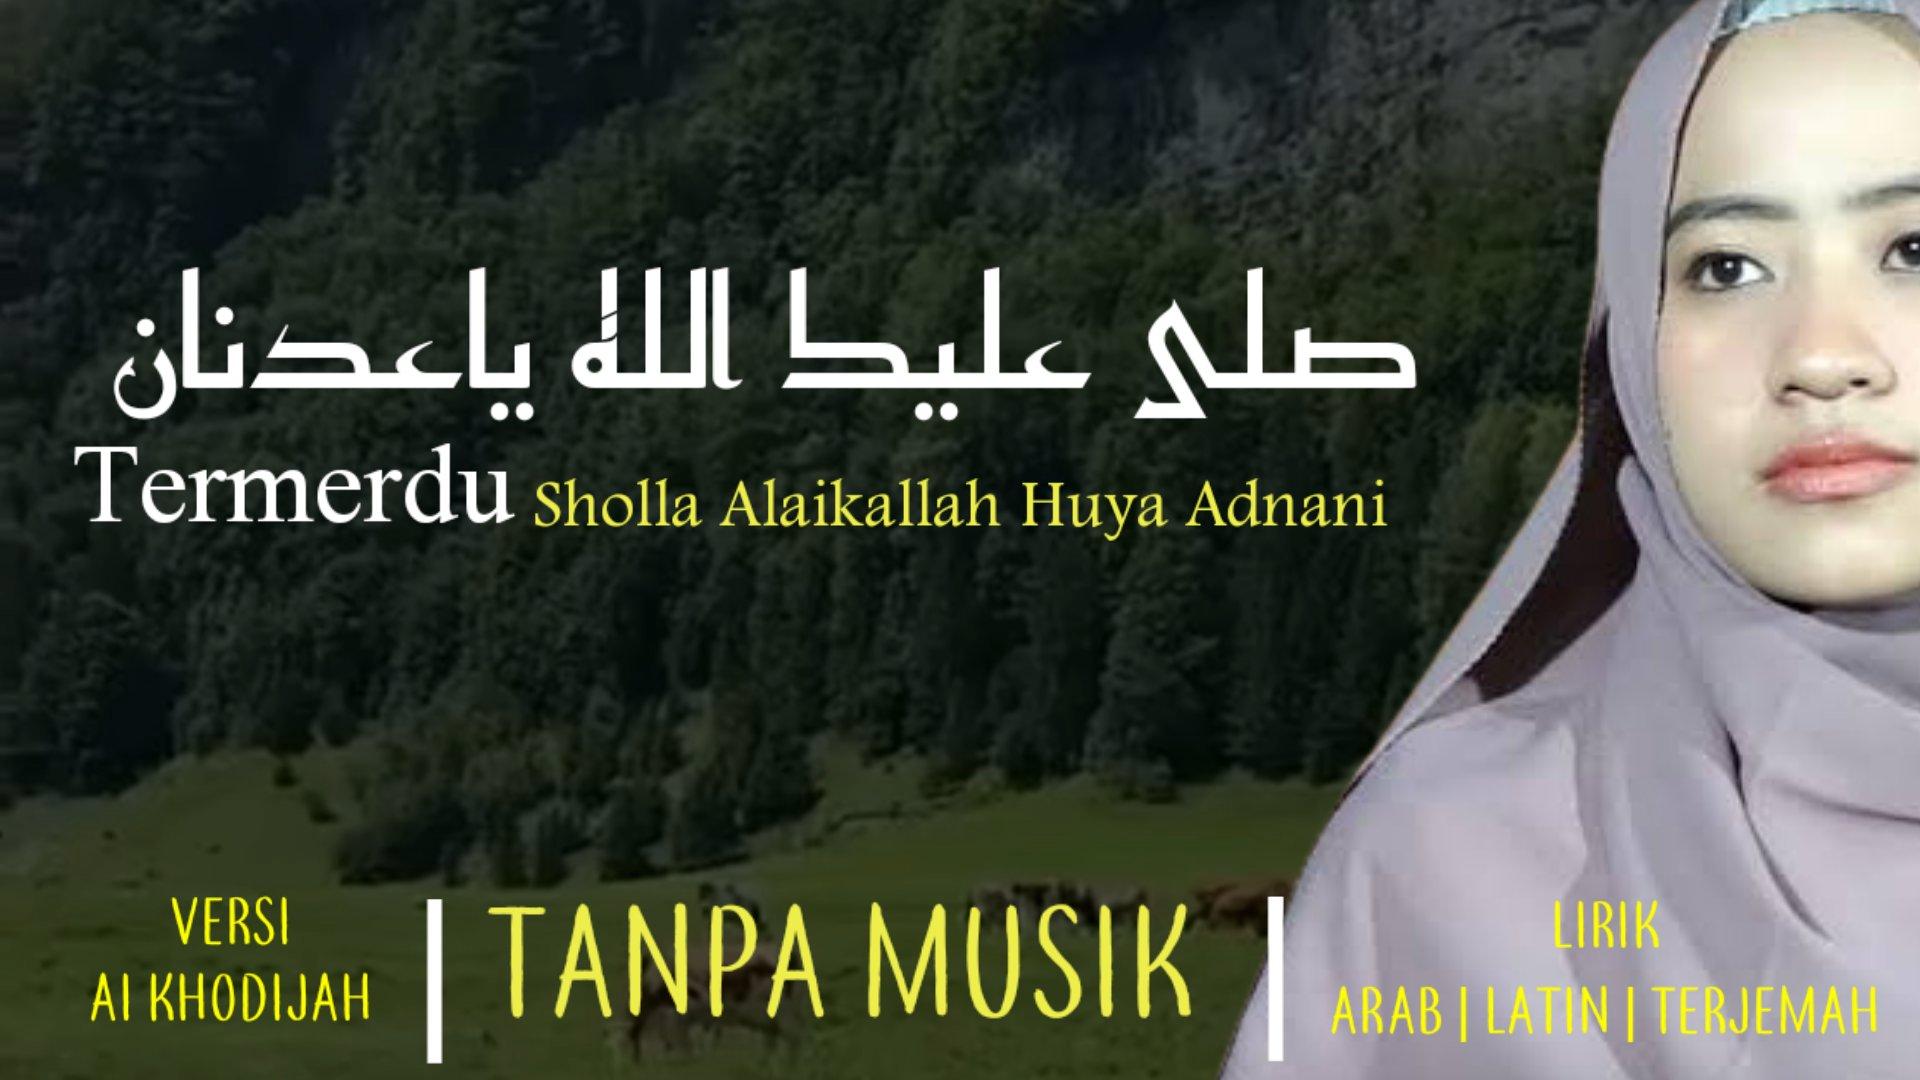 Lirik Sholla Alaikallah Huya Adnani Arab Latin Terjemah